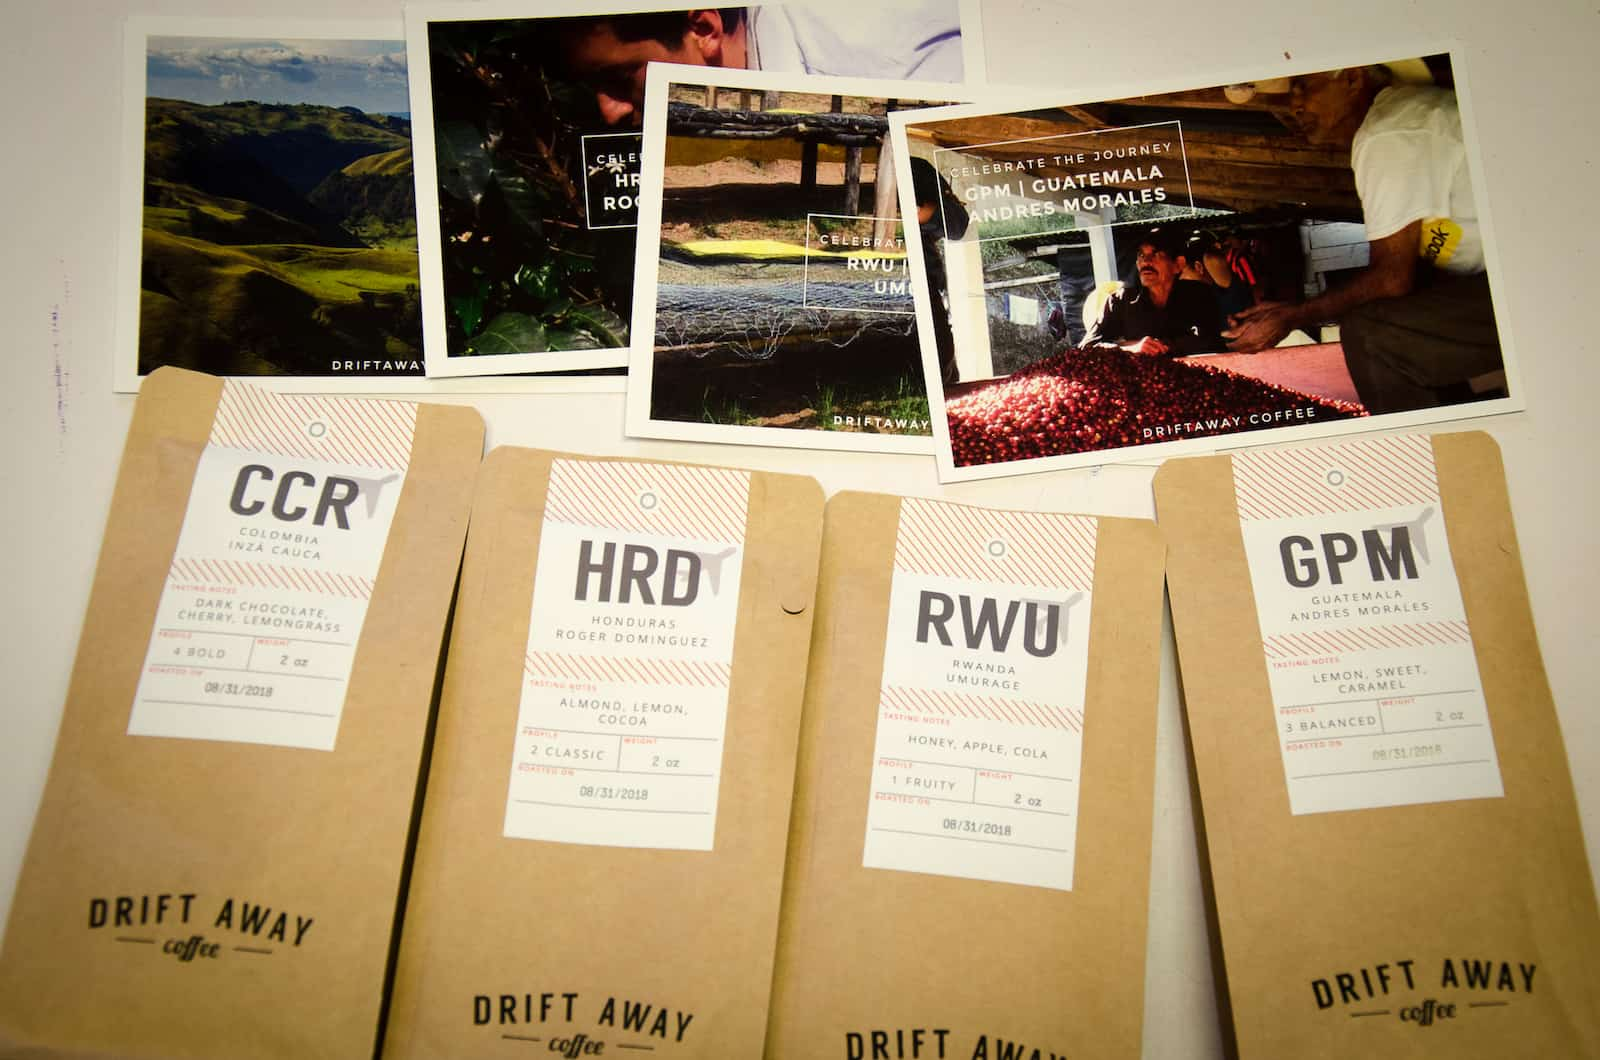 Driftaway coffee bags